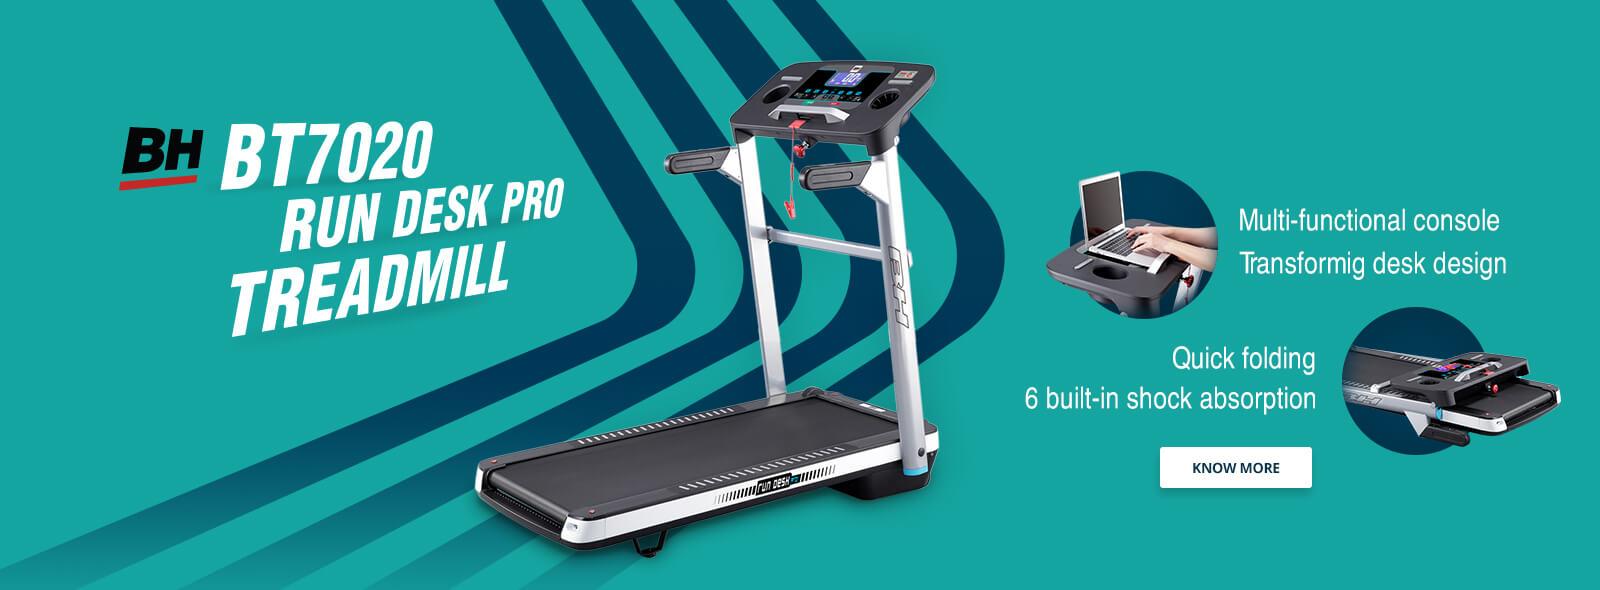 Buy Fitness Equipment Online India | Treadmills ...